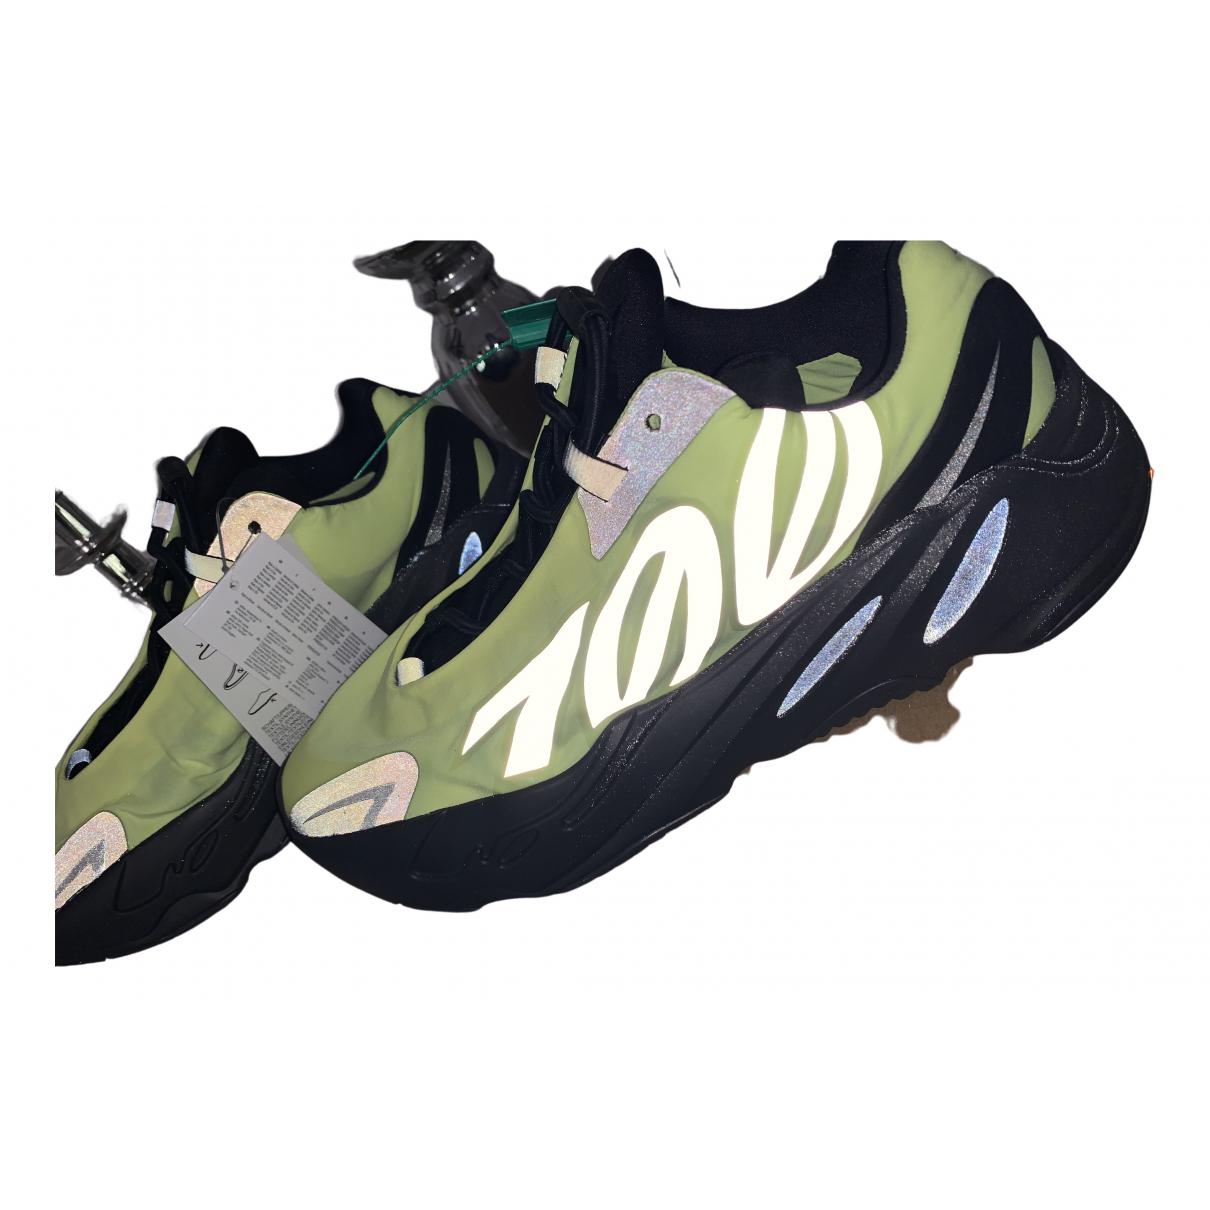 Yeezy X Adidas - Baskets 700 MNVN PHOSPHOR pour homme en toile - jaune